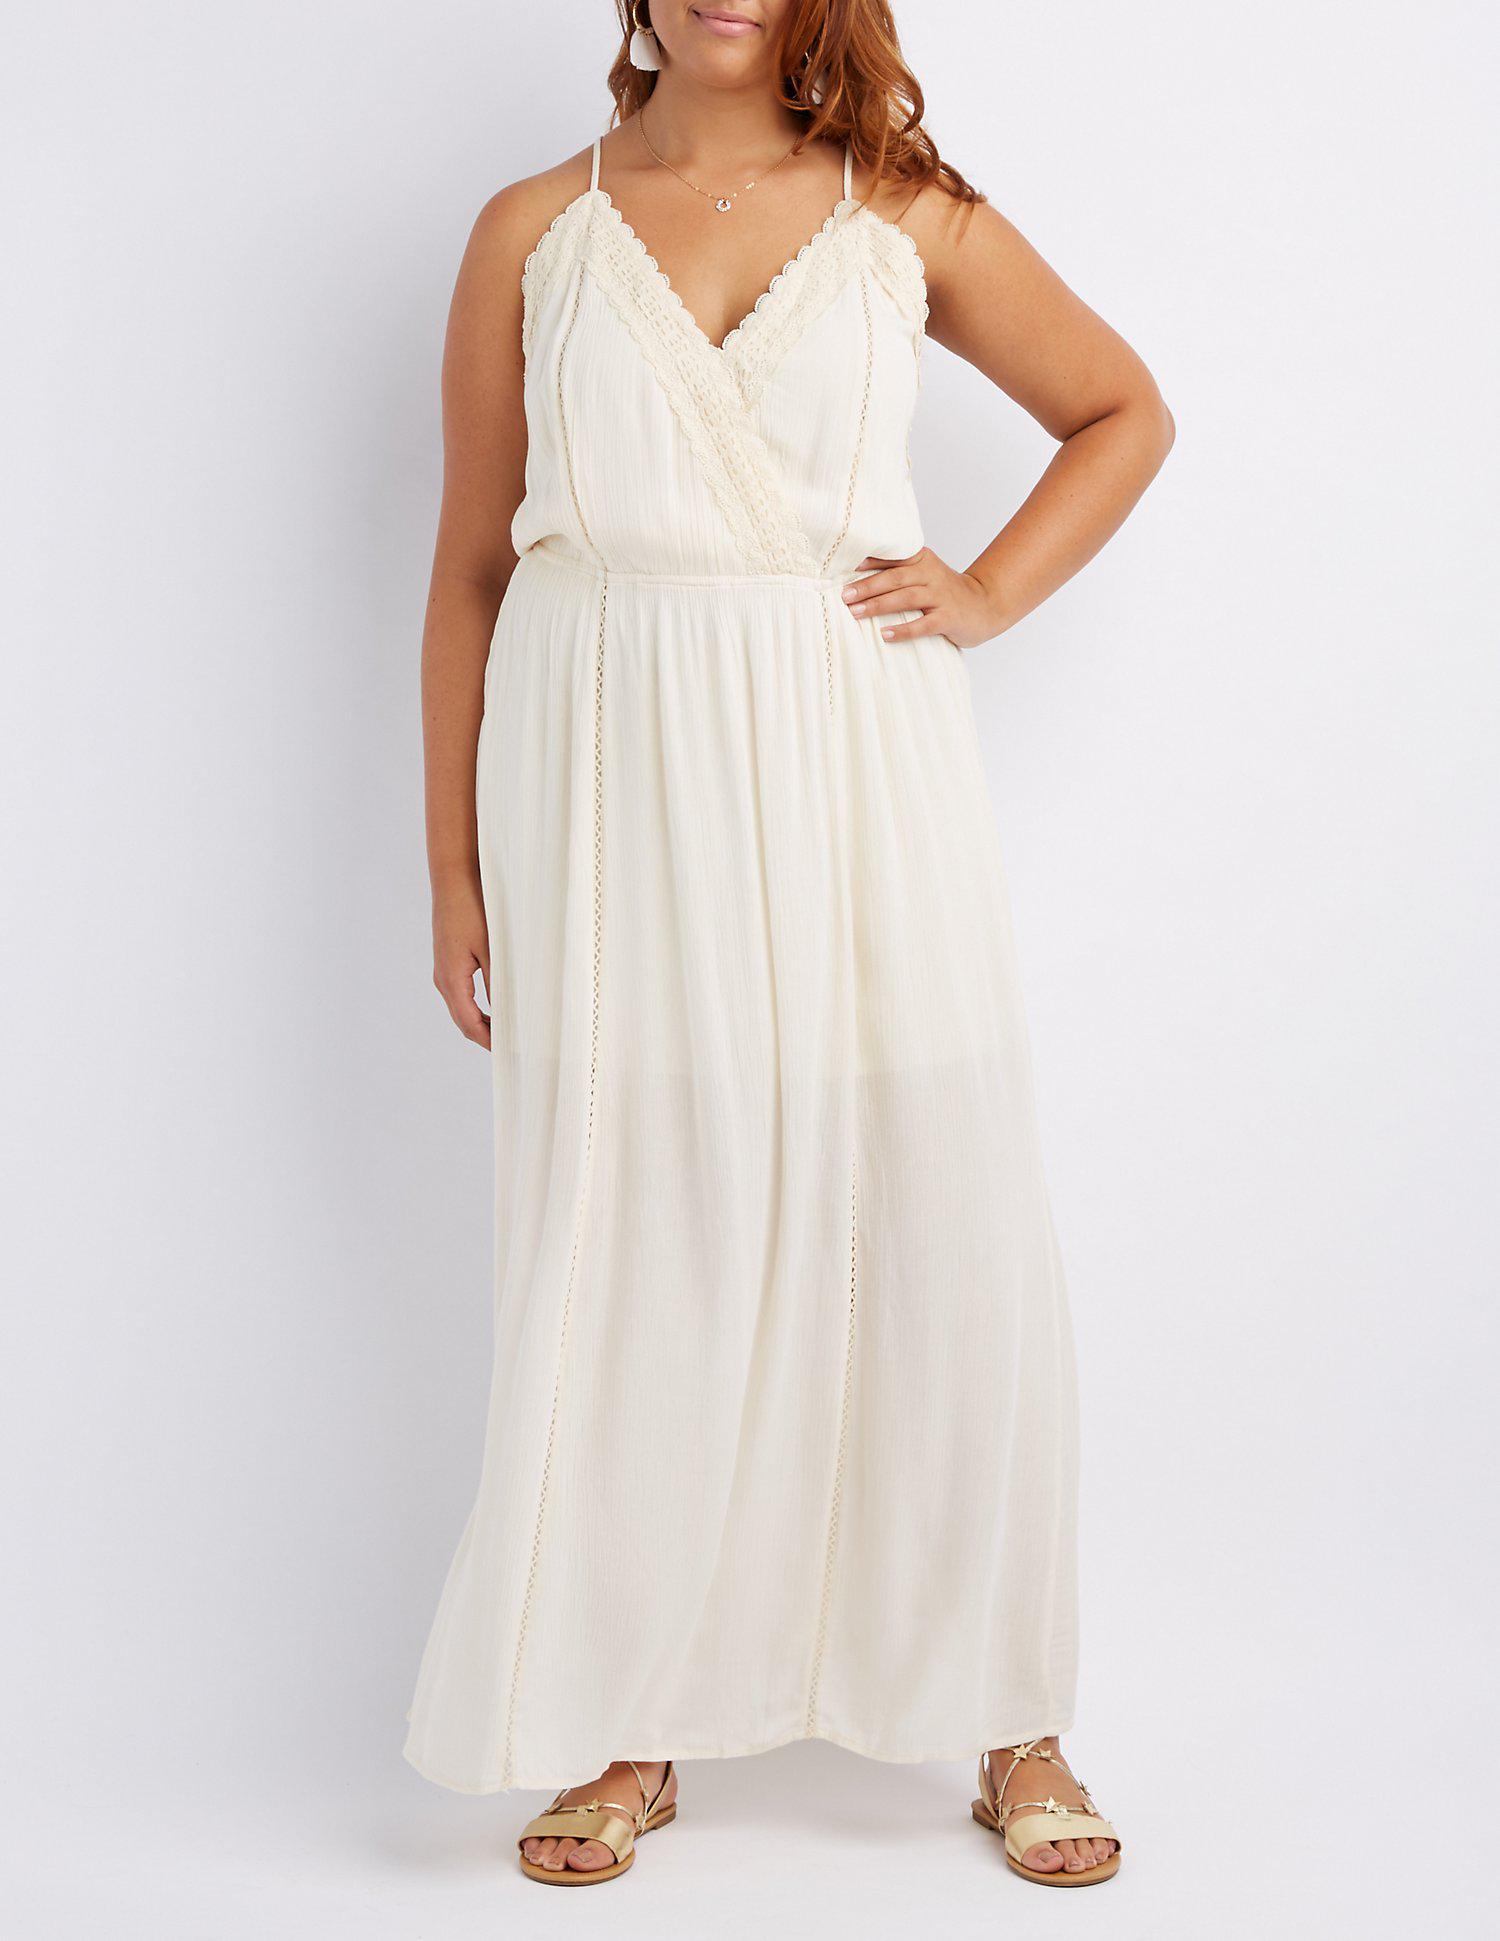 afa6eb21d89 Lyst - Charlotte Russe Plus Size Crochet-trim Maxi Dress in White